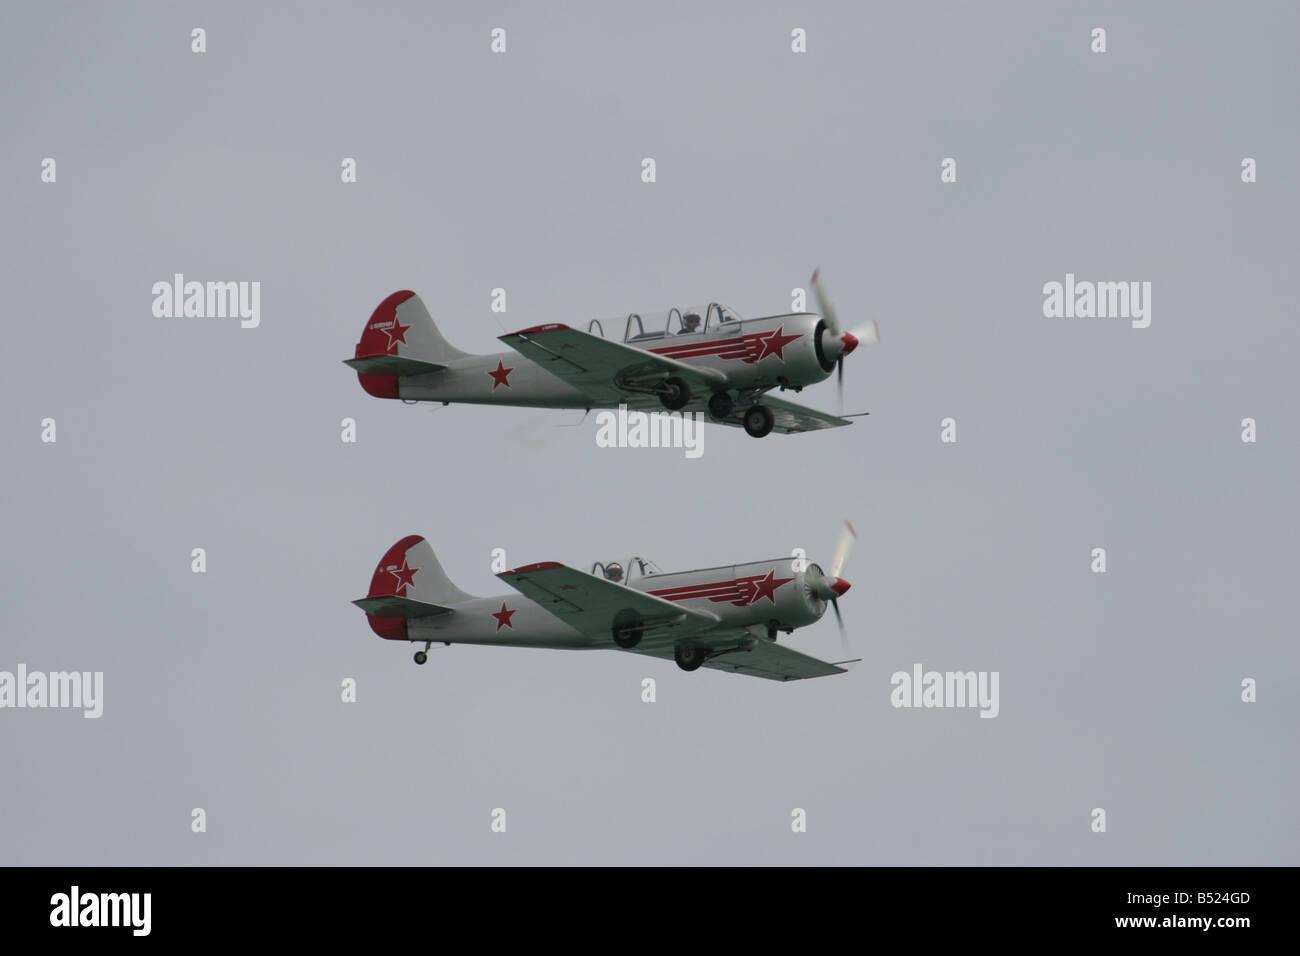 Aircraft Yakolev YAK 52 Display team single and twin seat training aircraft Stock Photo